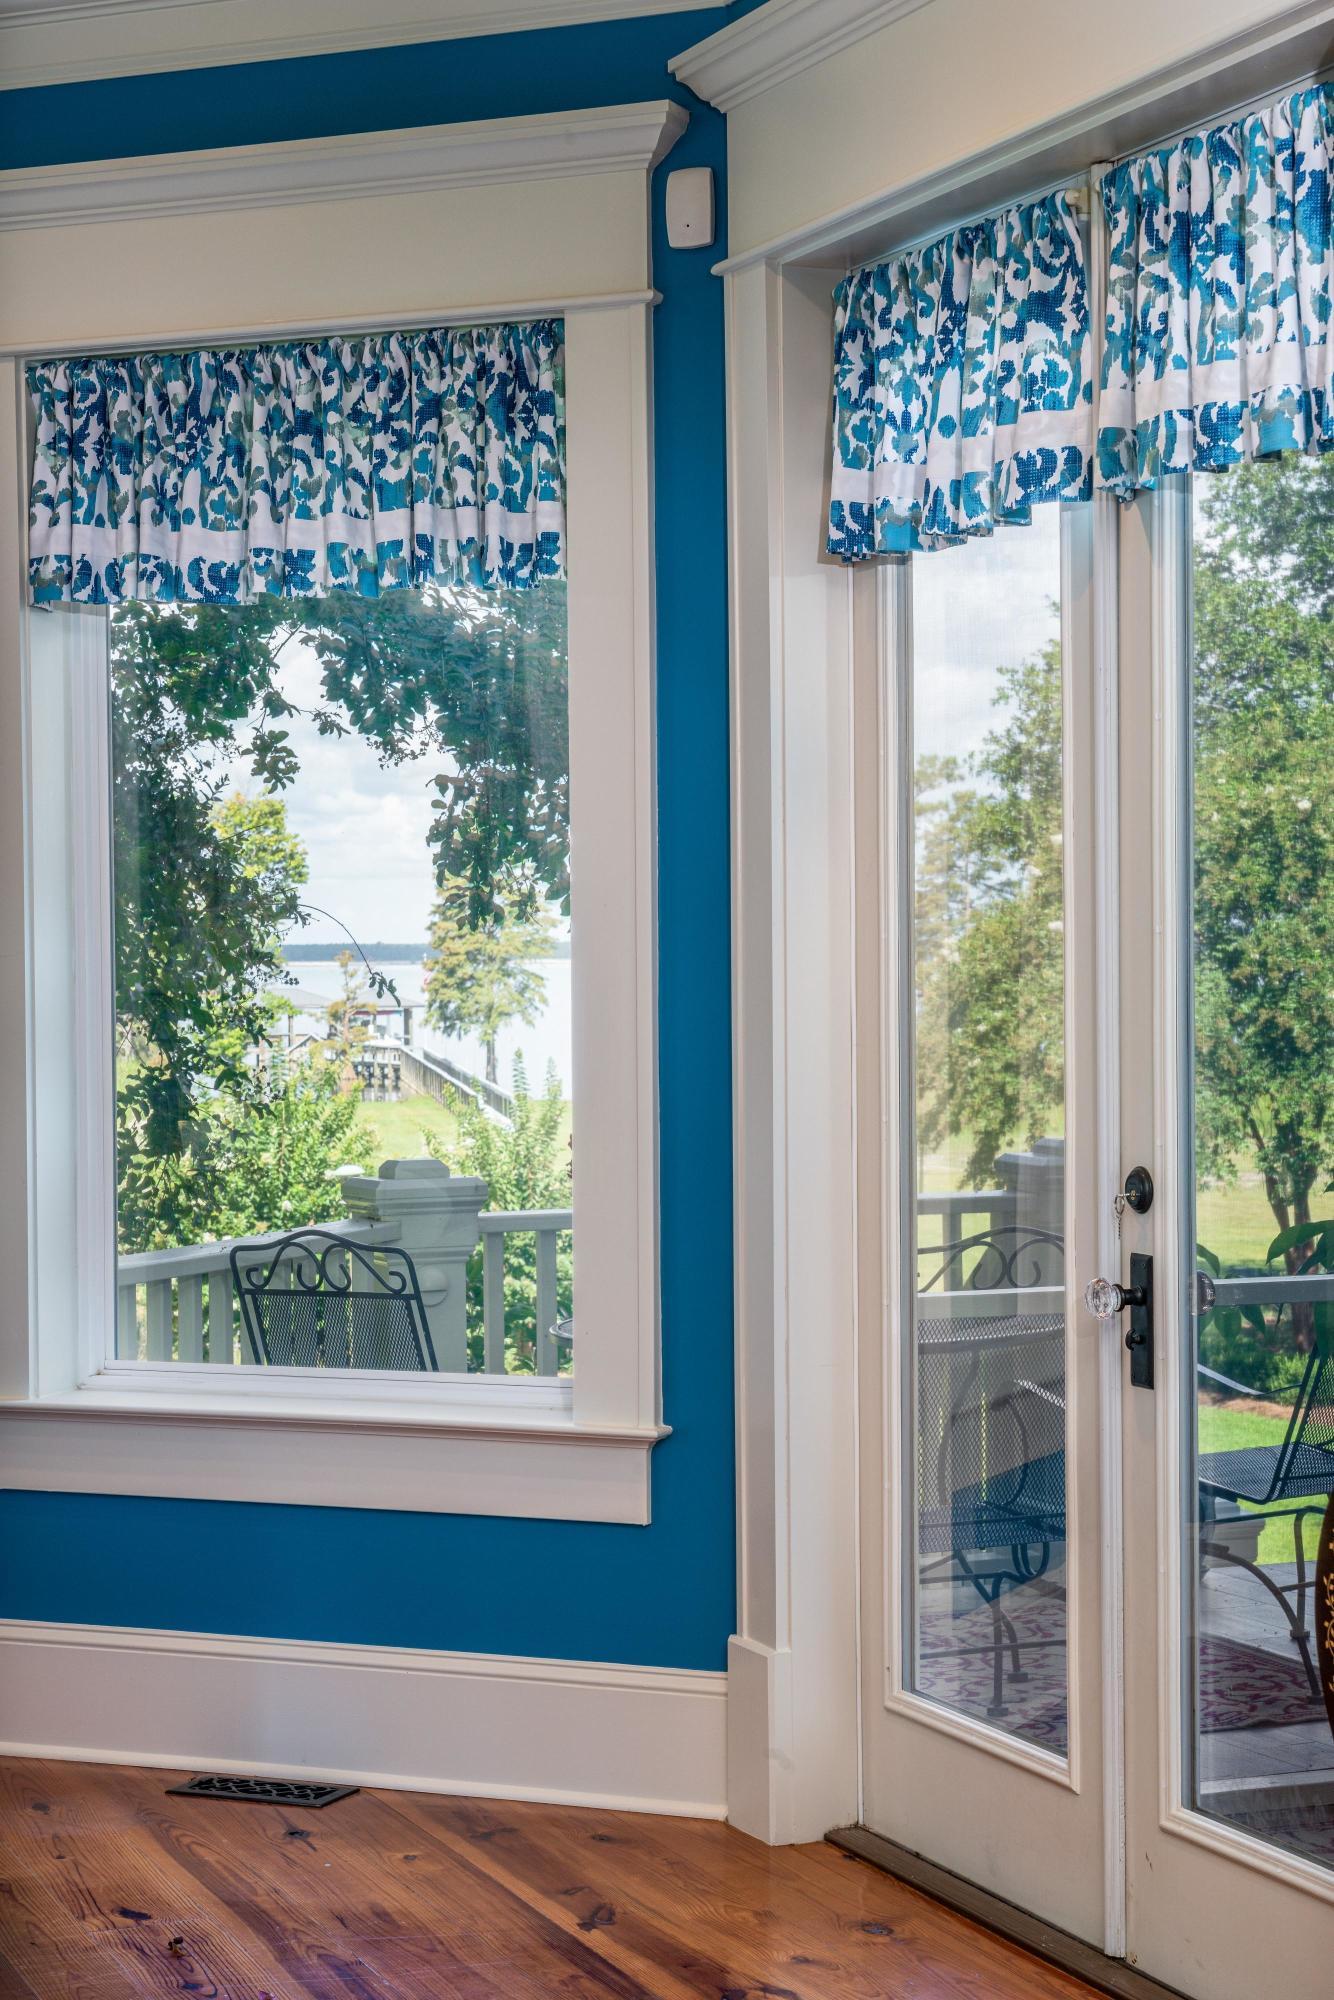 Broughton Hall Homes For Sale - 2058 Lakeshore, Pinopolis, SC - 6